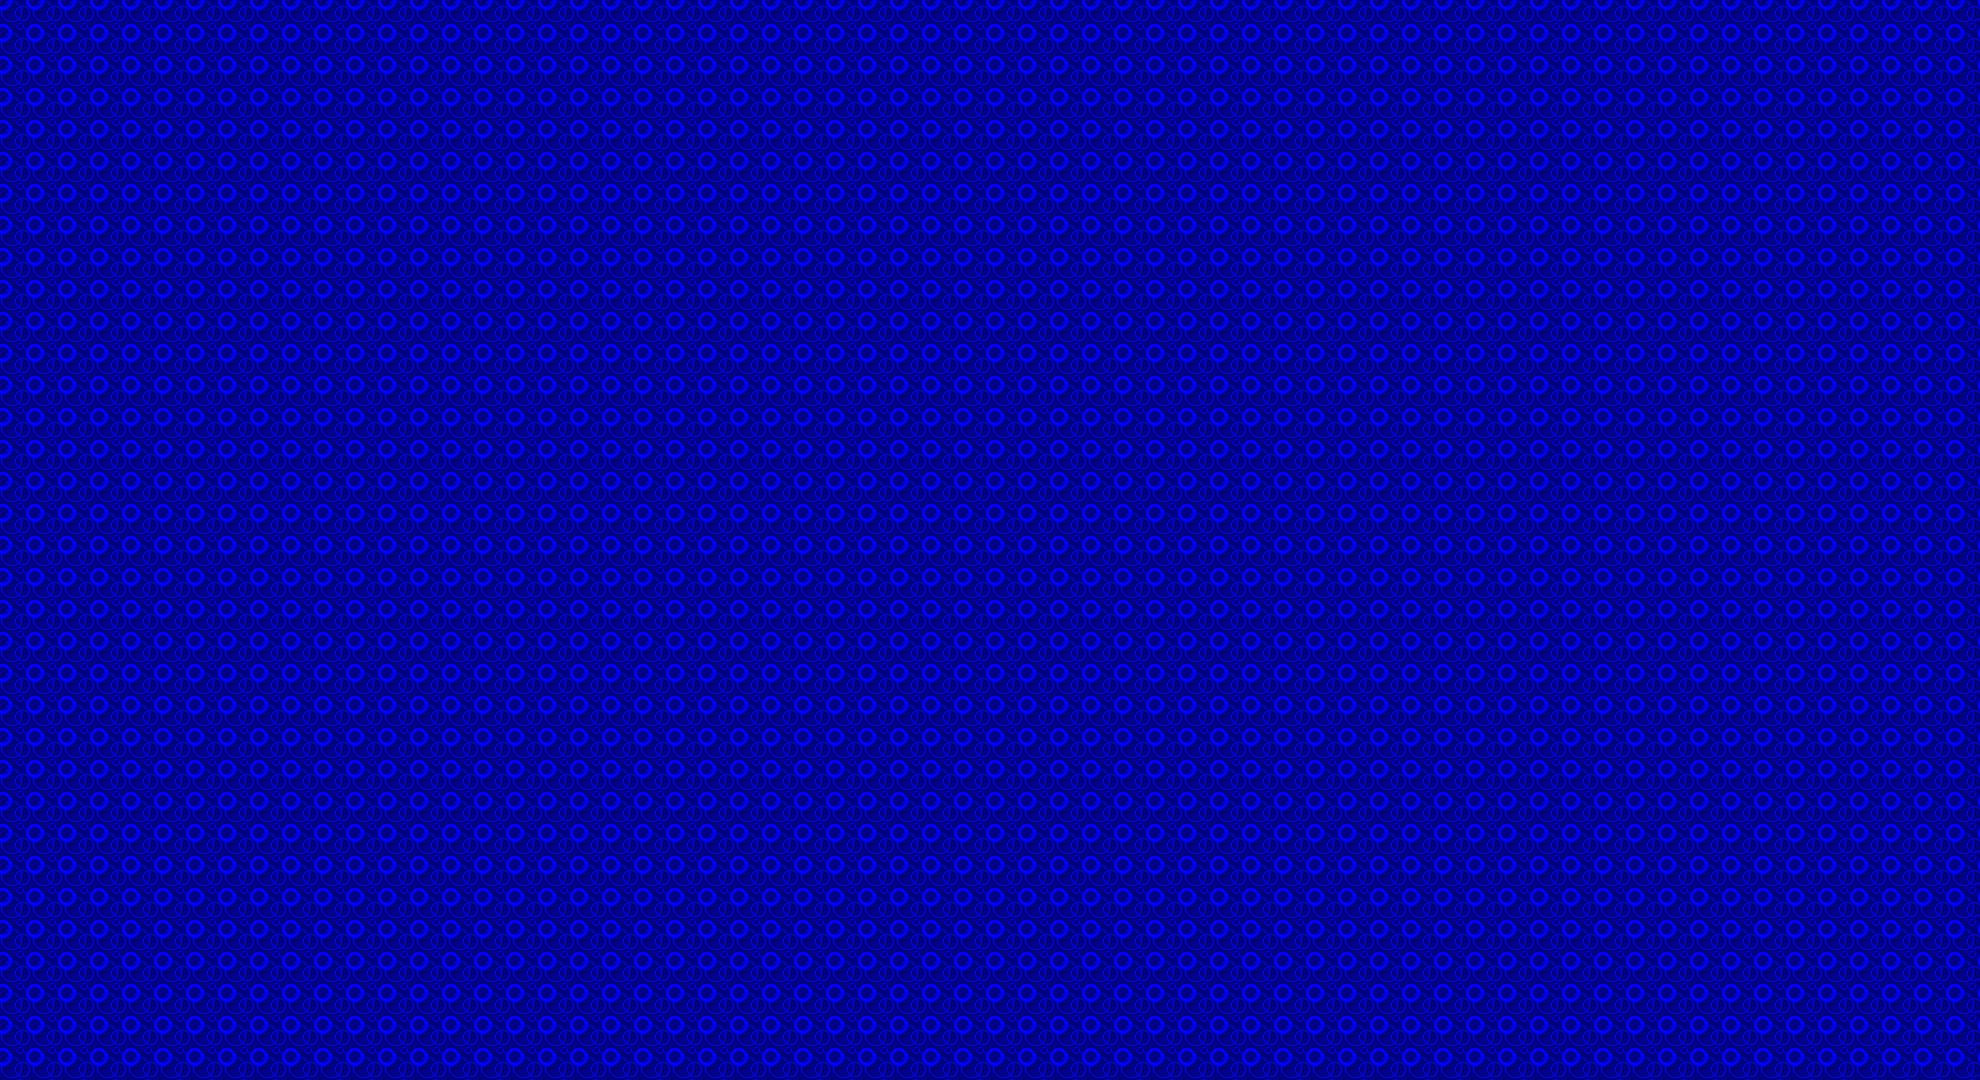 Windows 98 Wallpaper 71 Images